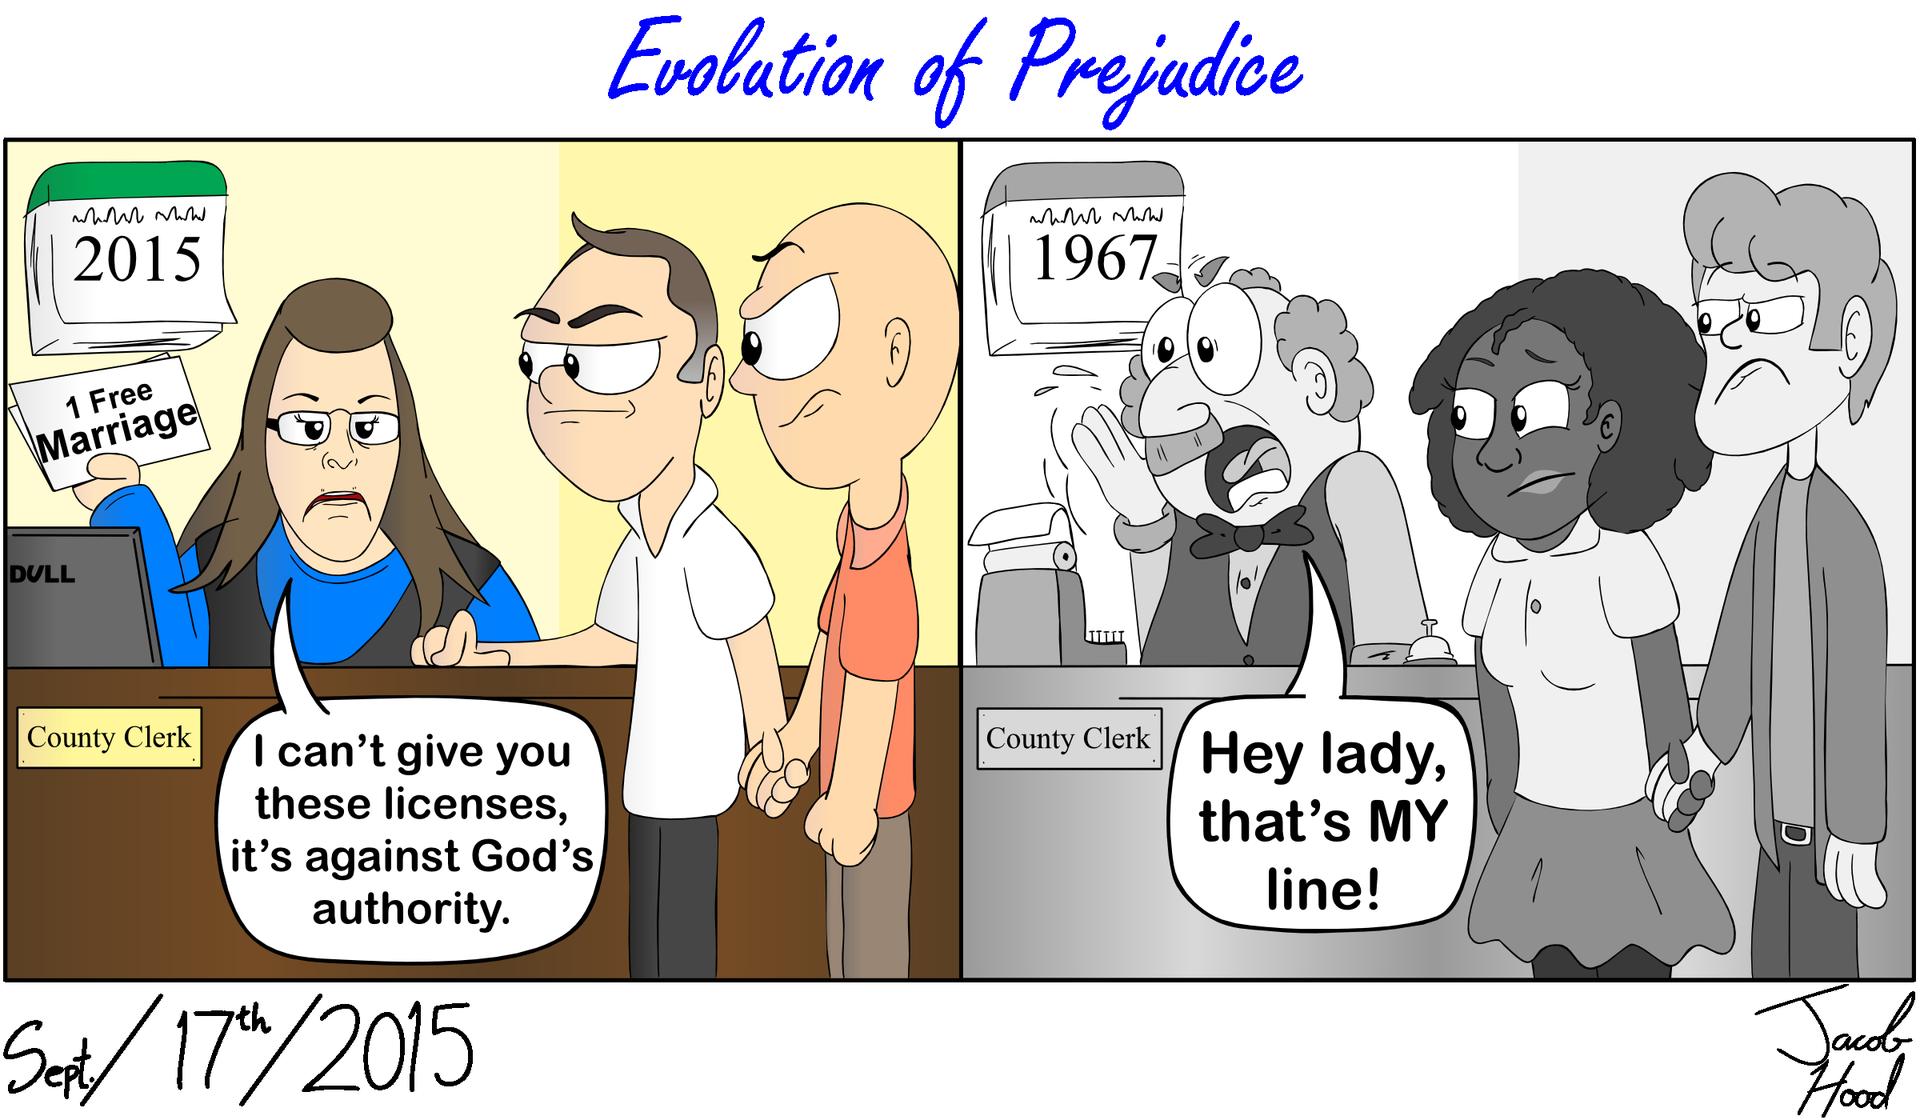 Evolution of Prejudice